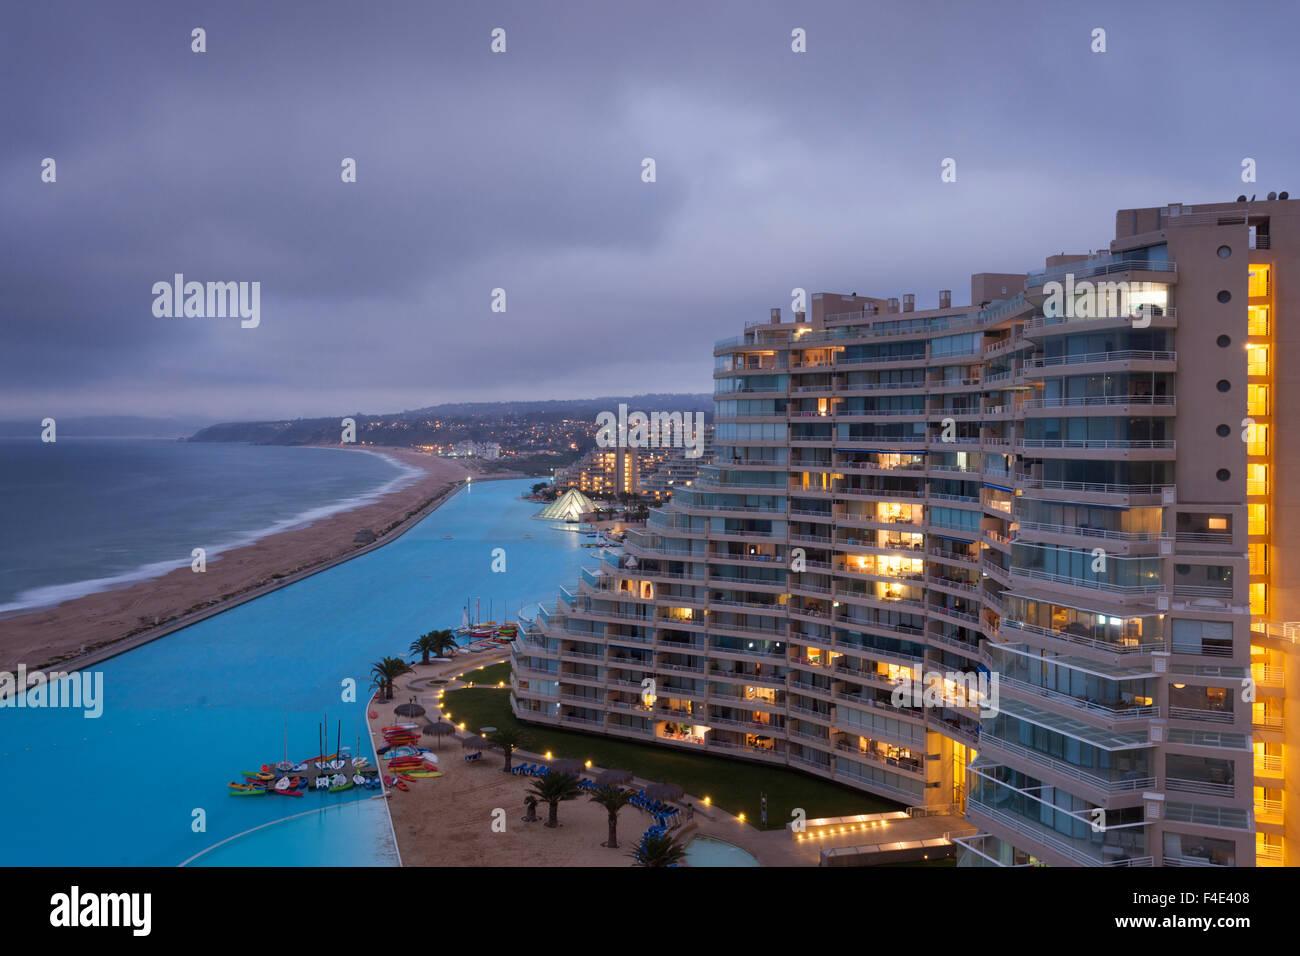 Algarrobo Chile Swimming Pool: Chile, Algarrobo. San Alfonso Del Mar Resort Has The World